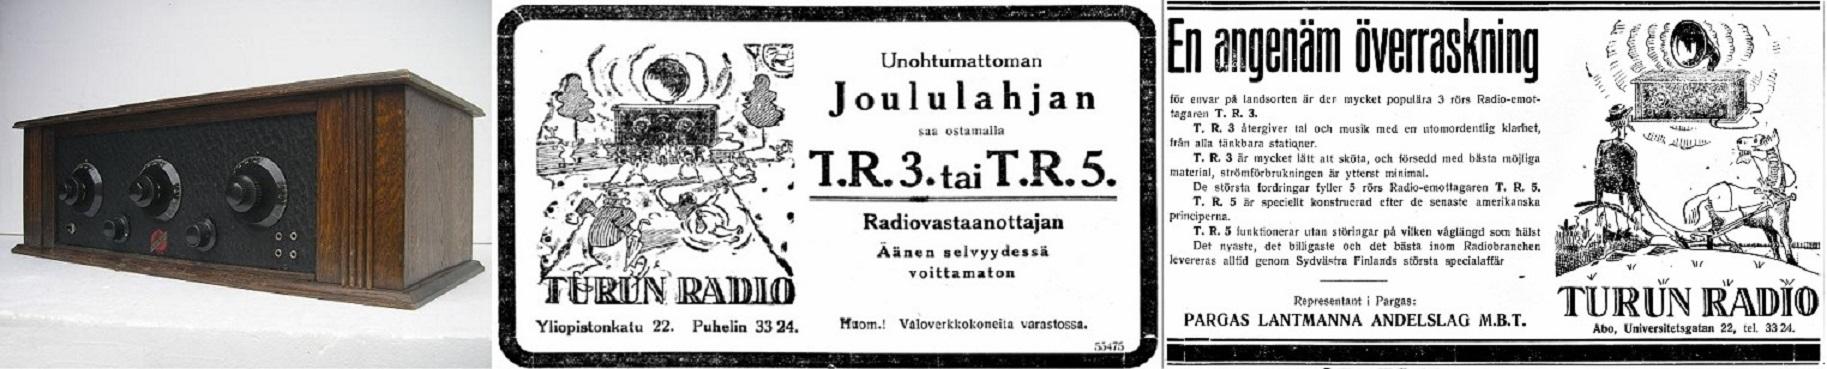 Kuva_Timo_Ratasaari_Turun_Radio__Turun_Sanomat_no_350_1928__Pargas_Kungcrelser_nr_41_1928.jpg